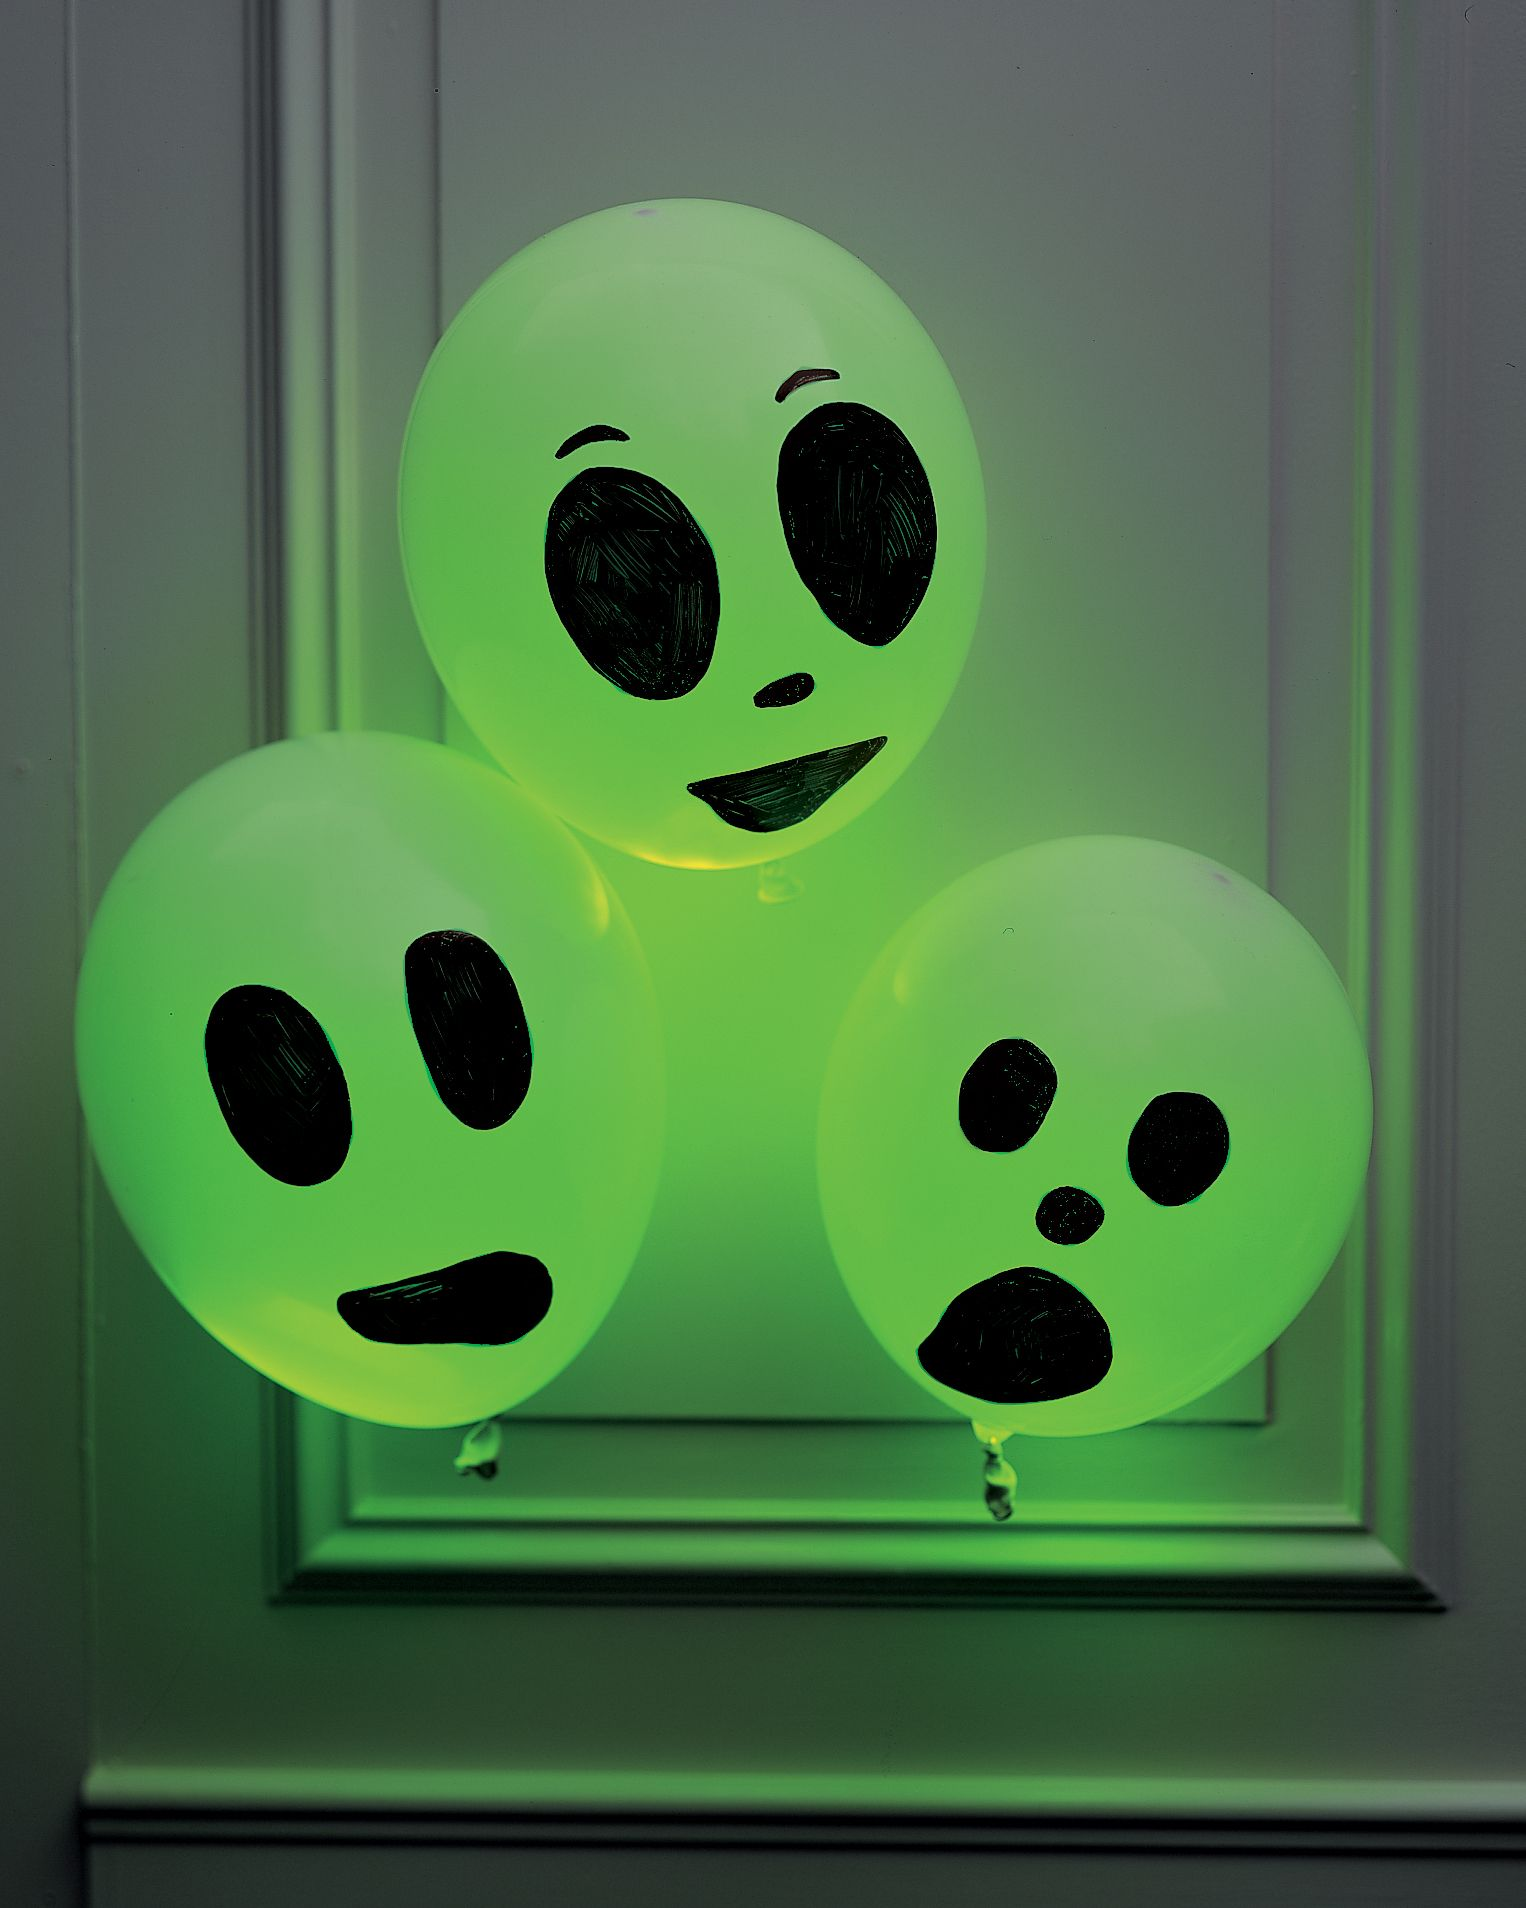 halloween ghost decorations | halloween inspiration | pinterest